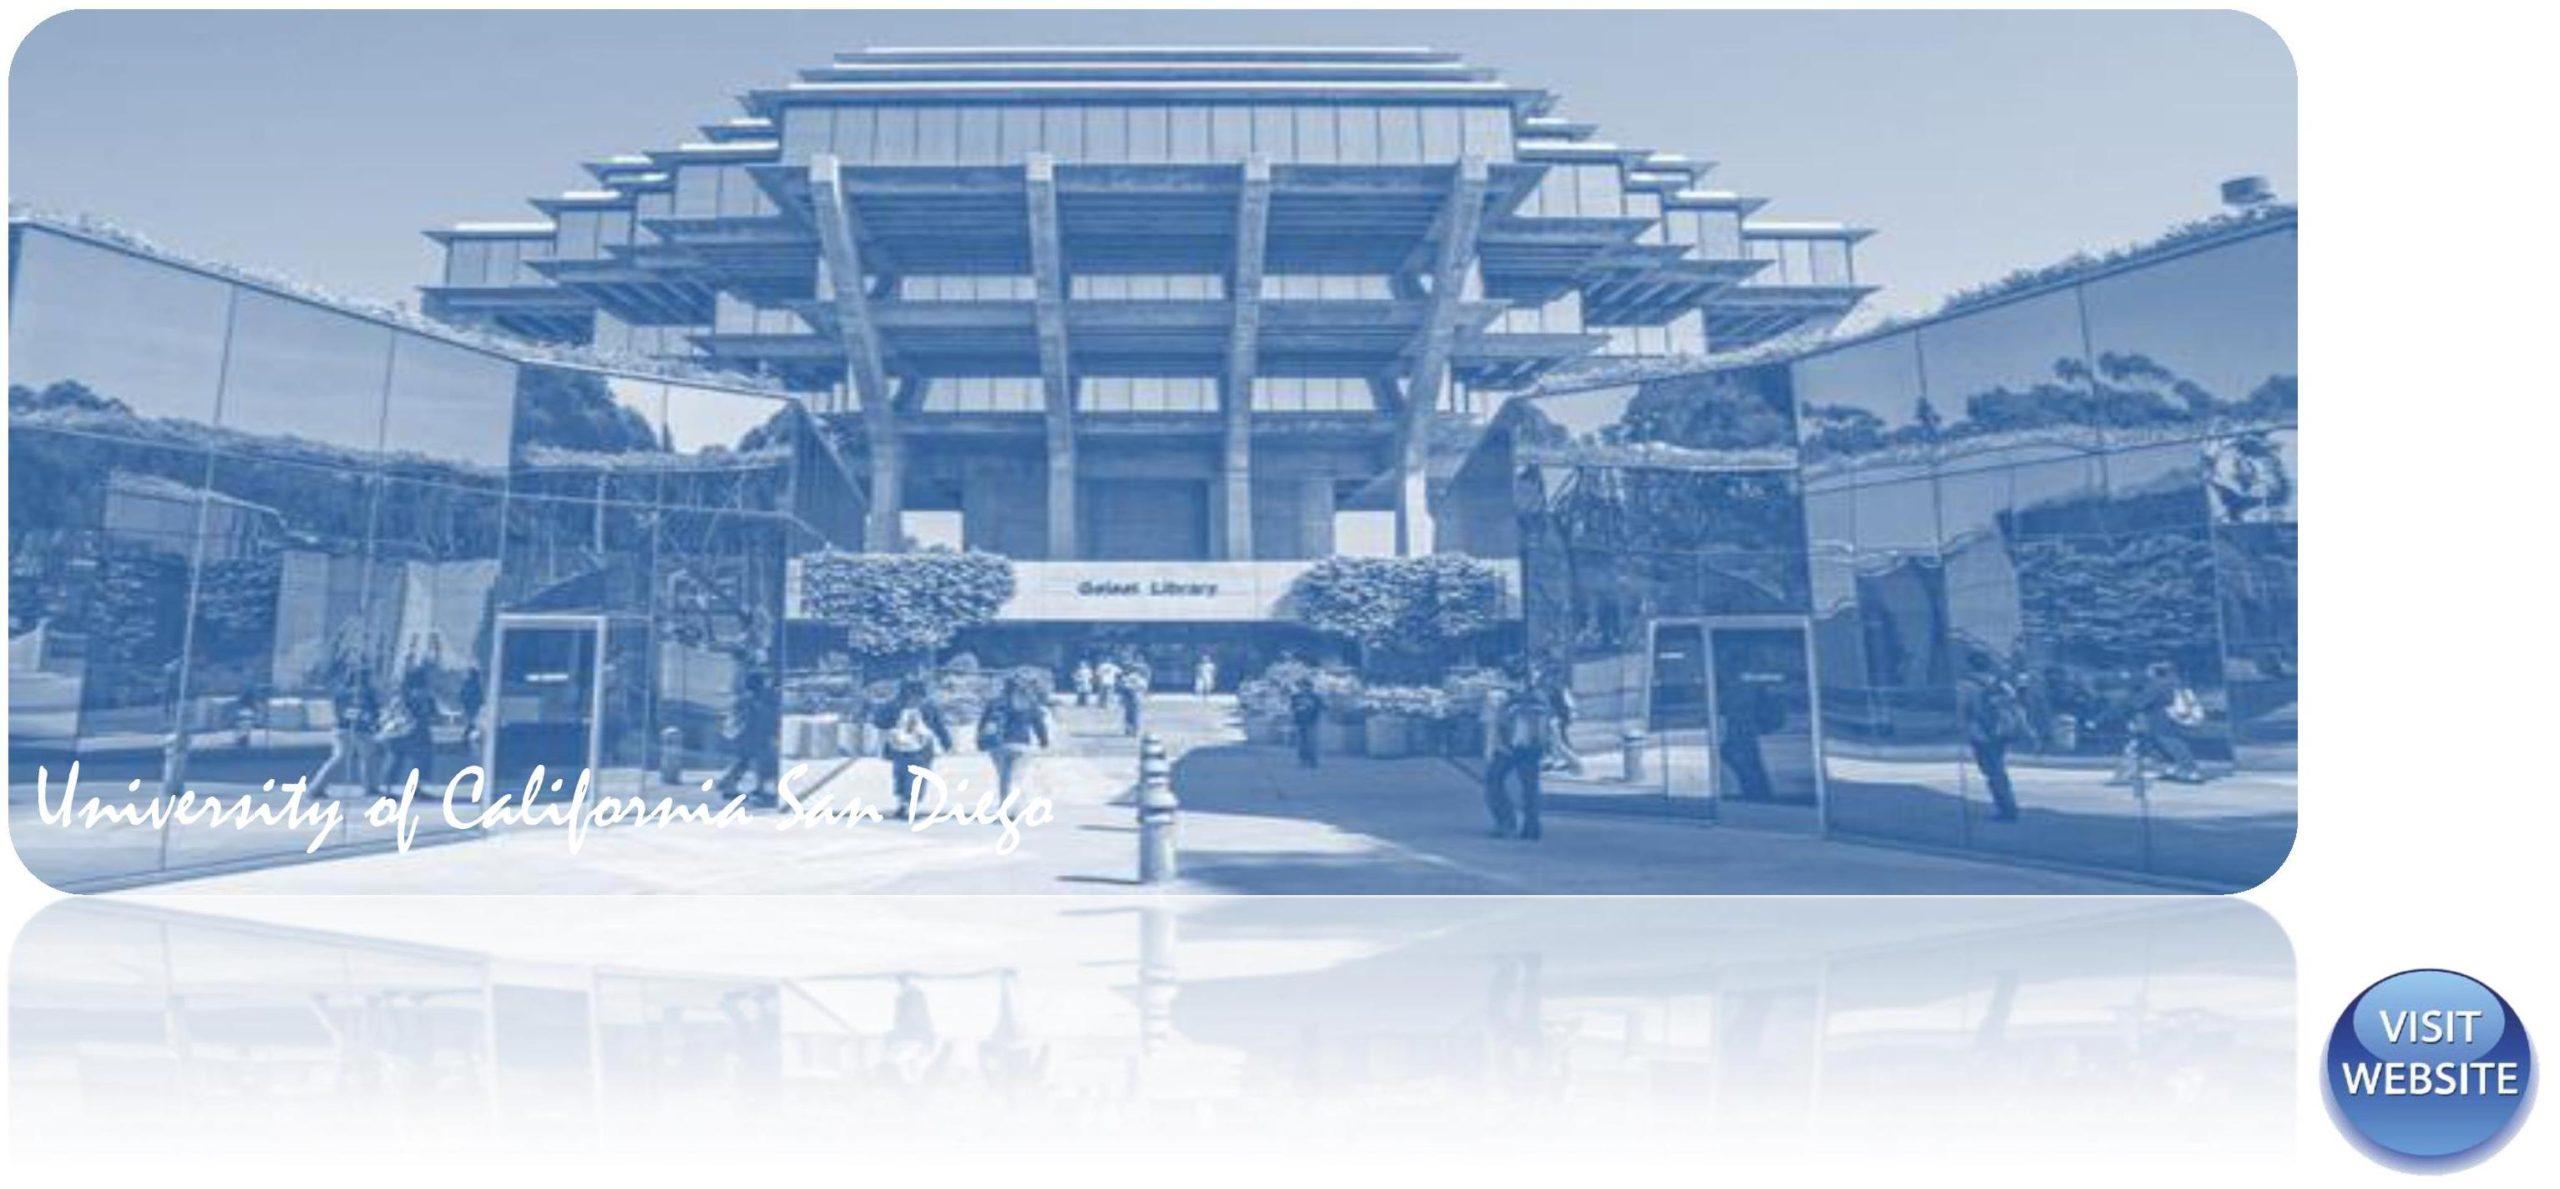 University of California San Diego USA